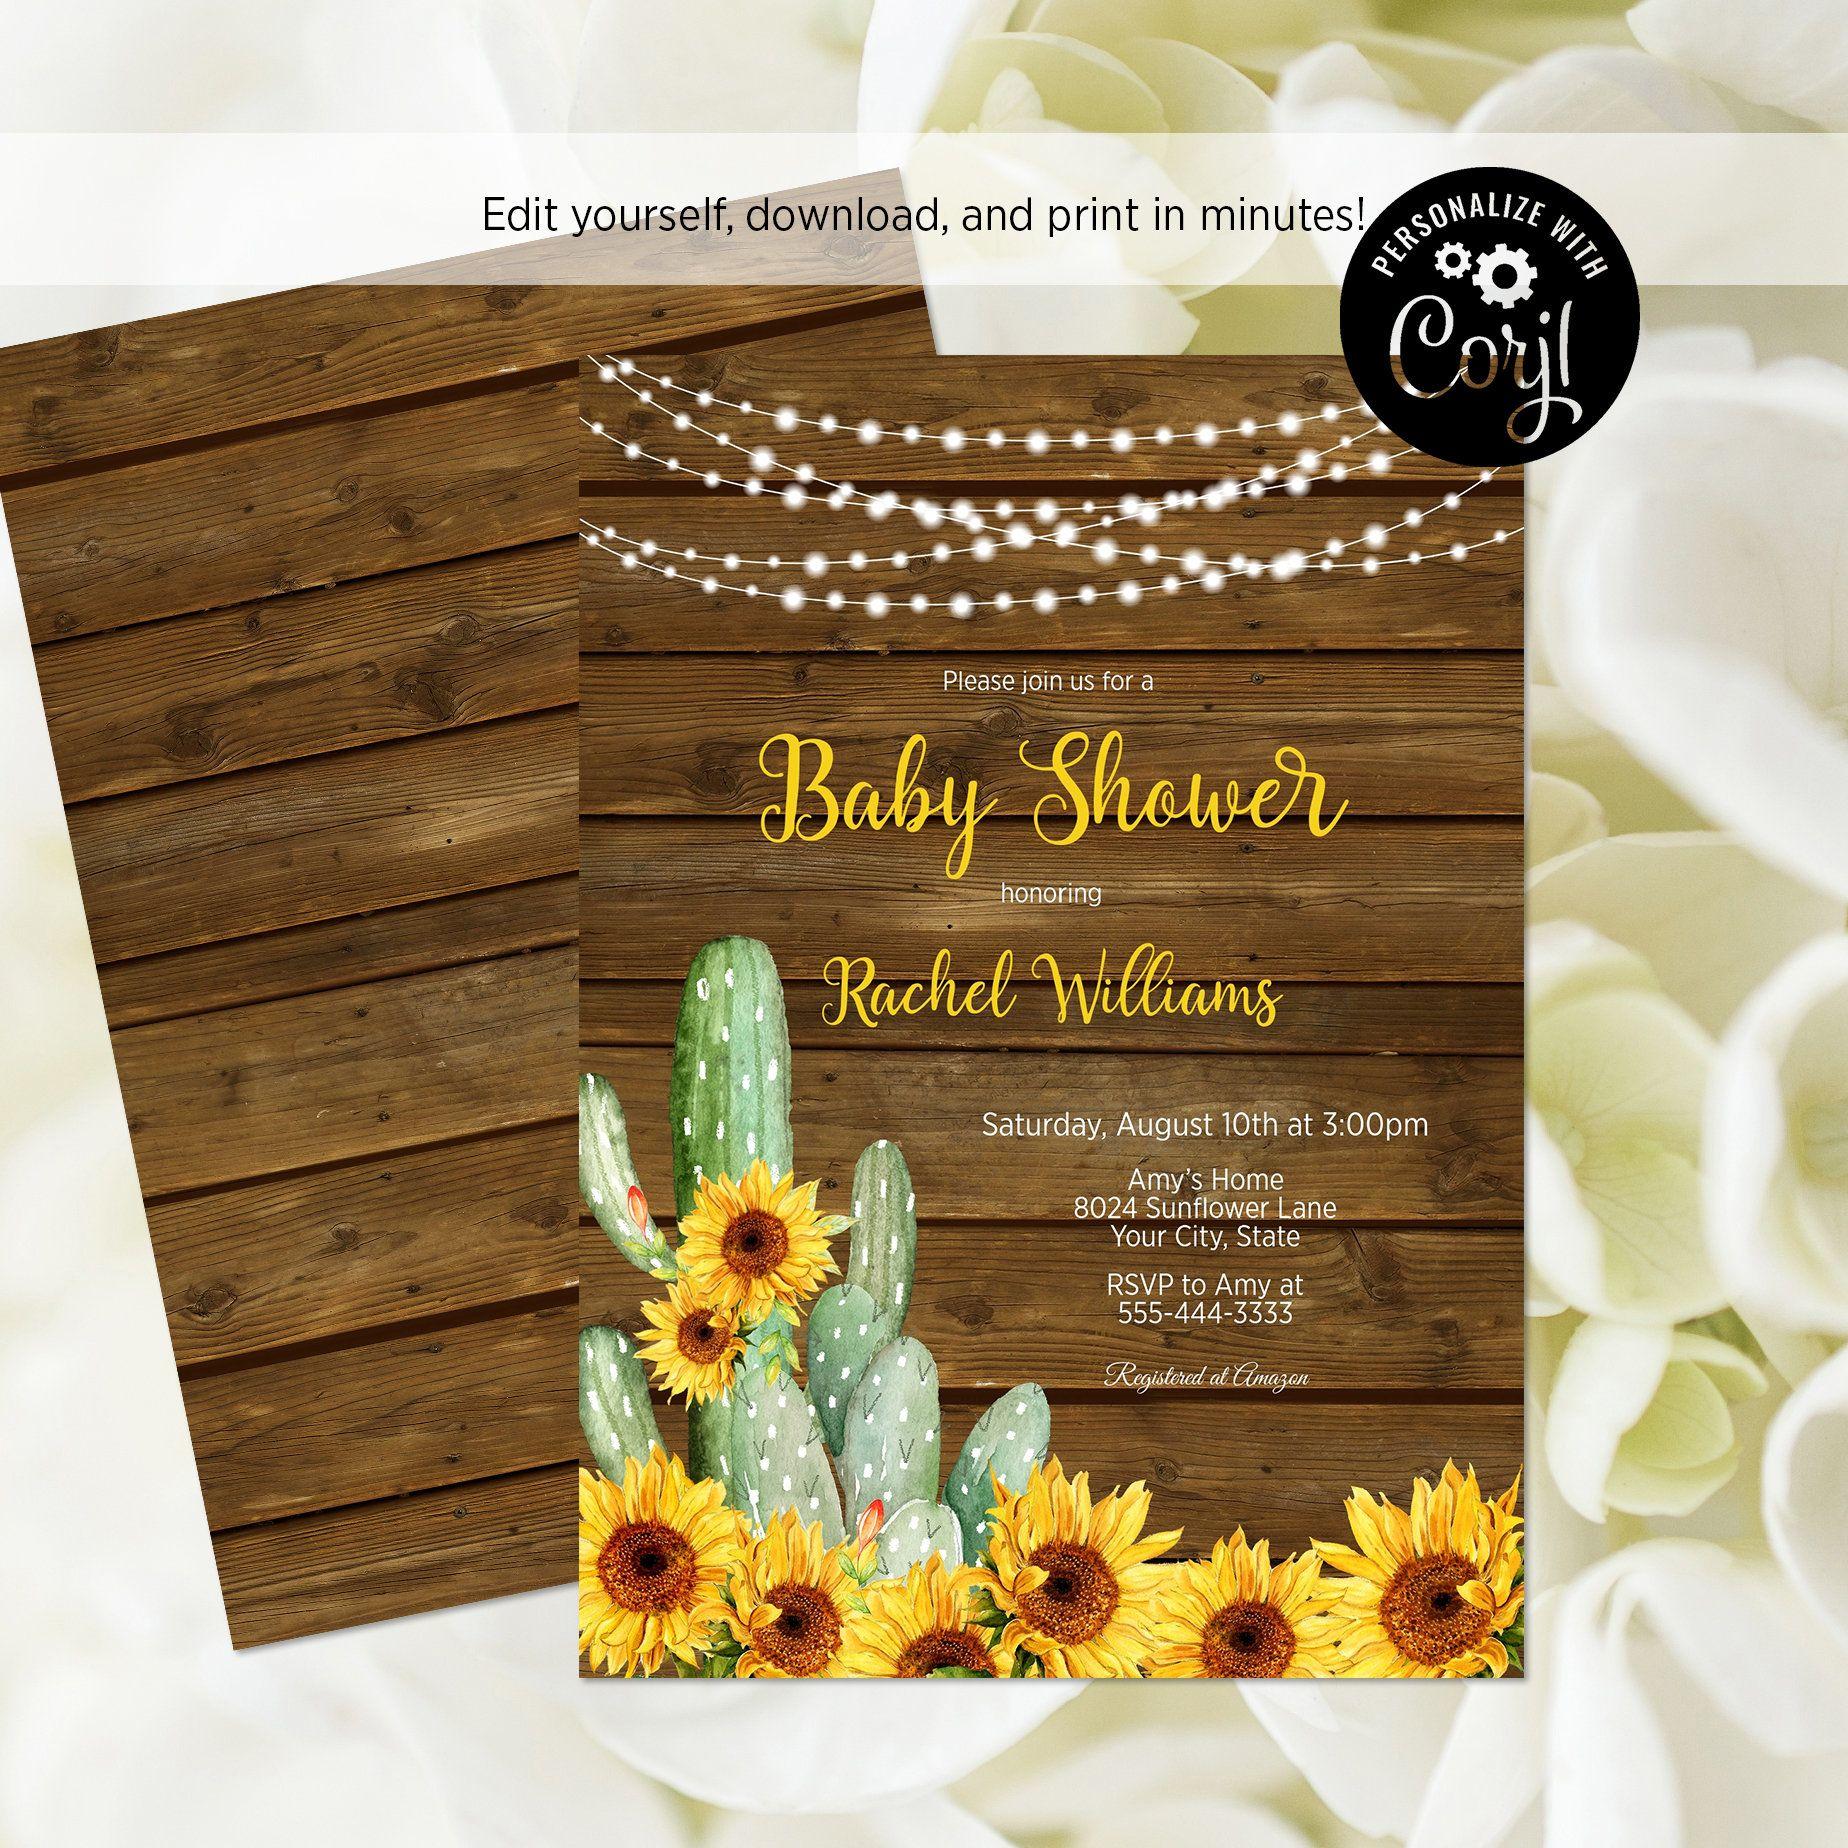 Cacti Baby Shower Invitation EDITABLE Invitation Printable Baby Shower Invitation Template, YELLOW bg Baby Shower Invite Corjl